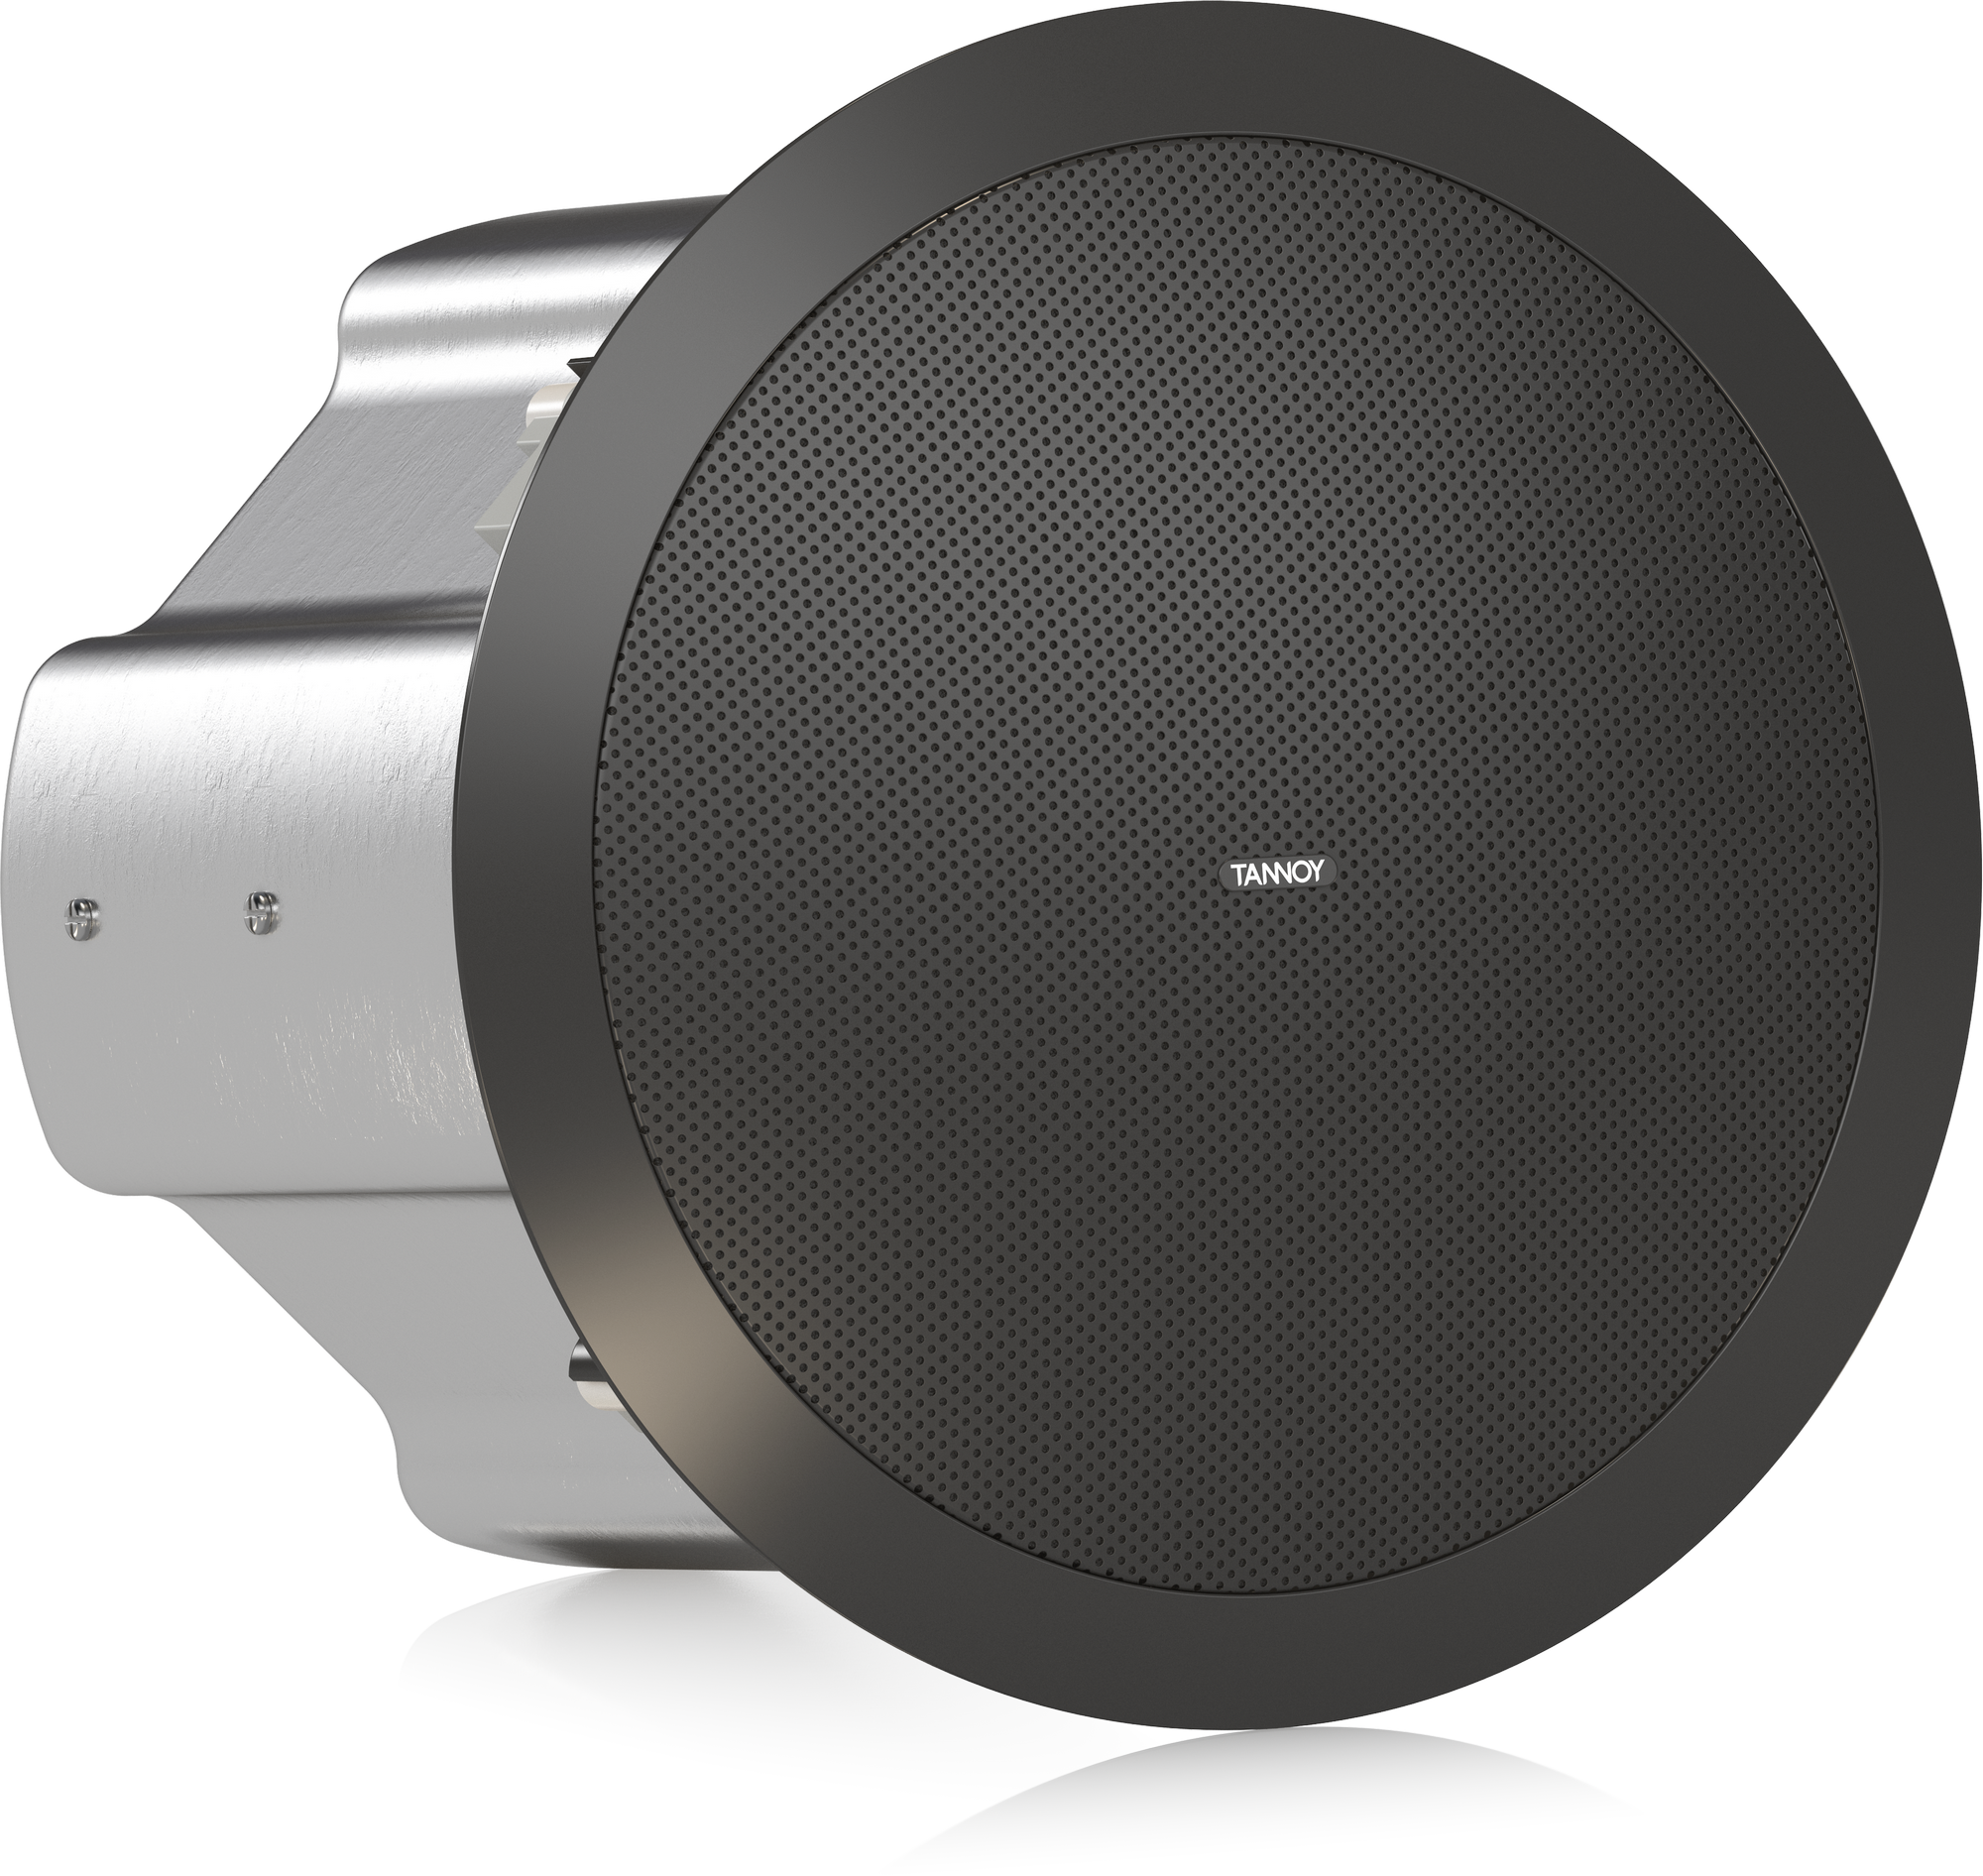 Tannoy  CVS 601-BK - Haut-parleur d'installation